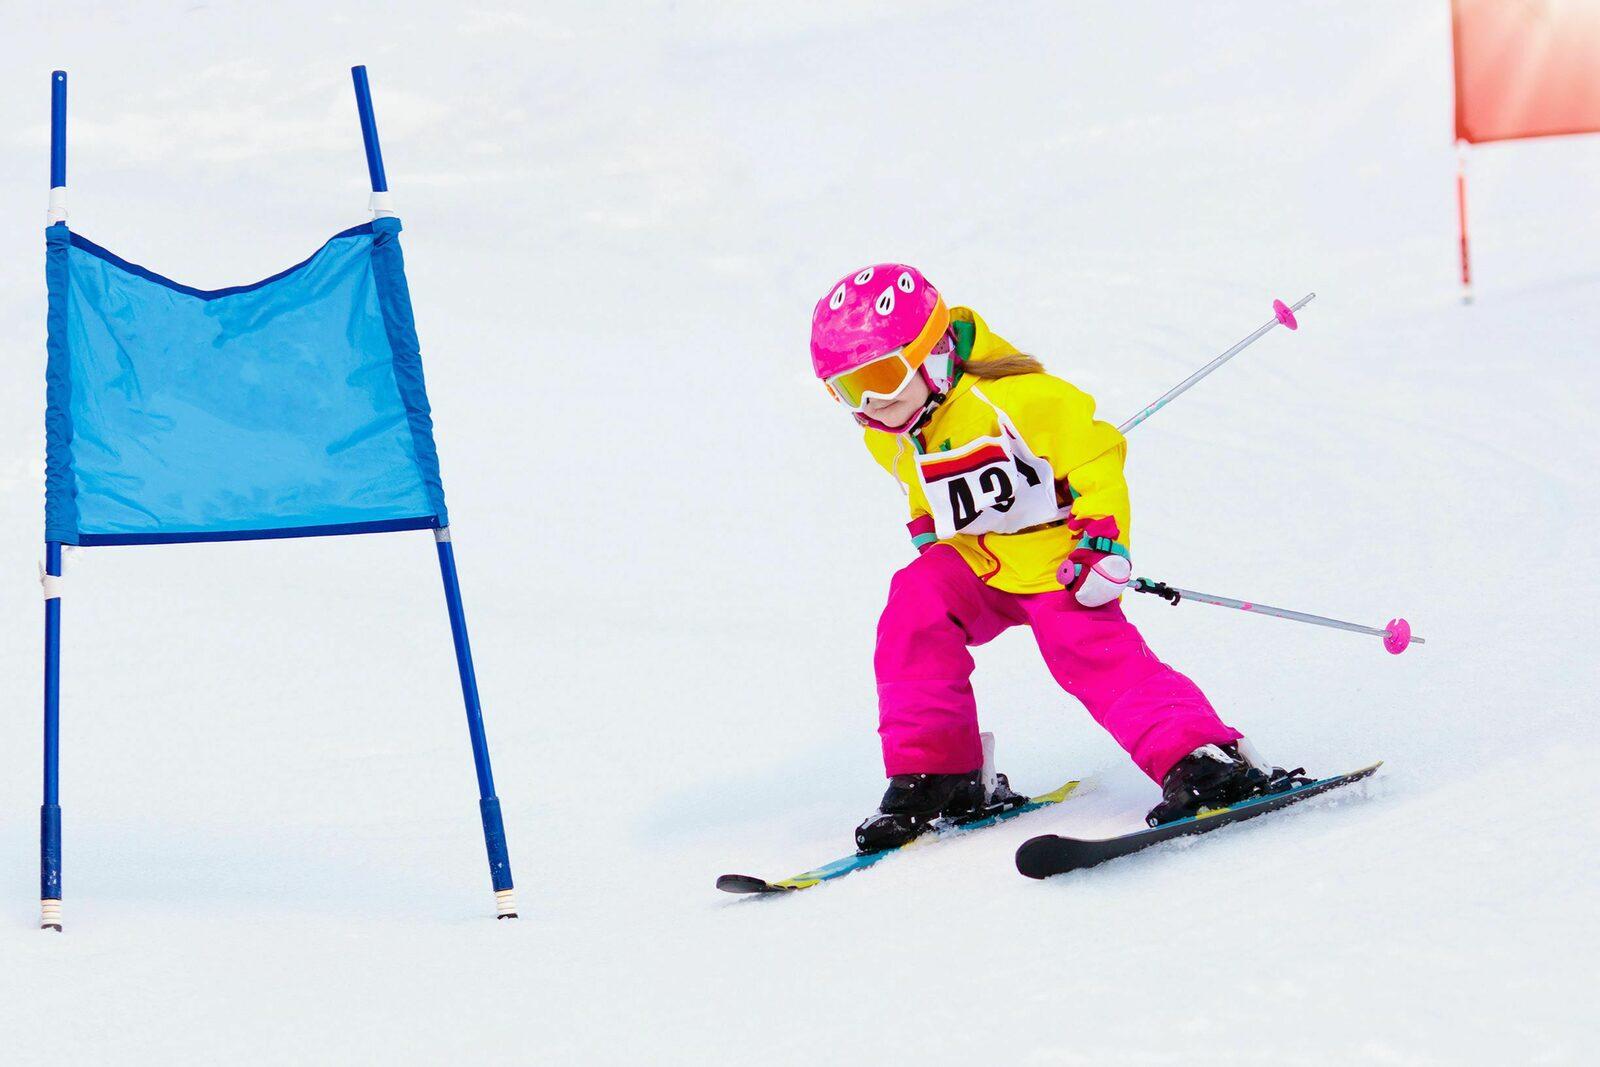 ESF-Skischule in La Chapelle d'Abondance